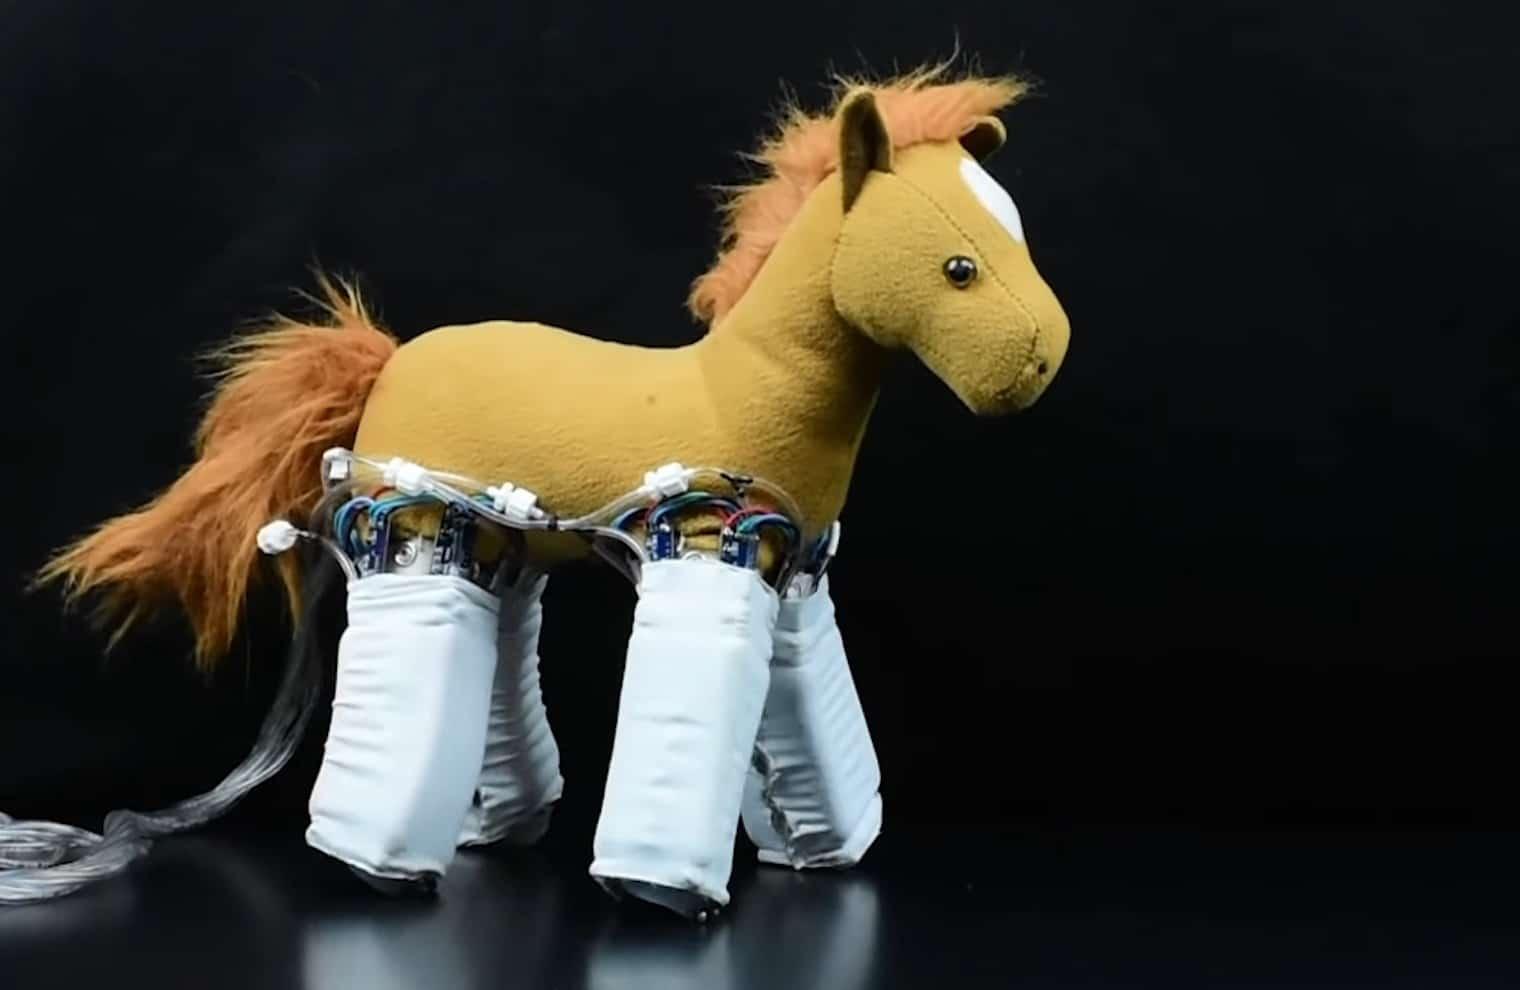 Robotic Skins: Aus Kuscheltieren werden Roboter